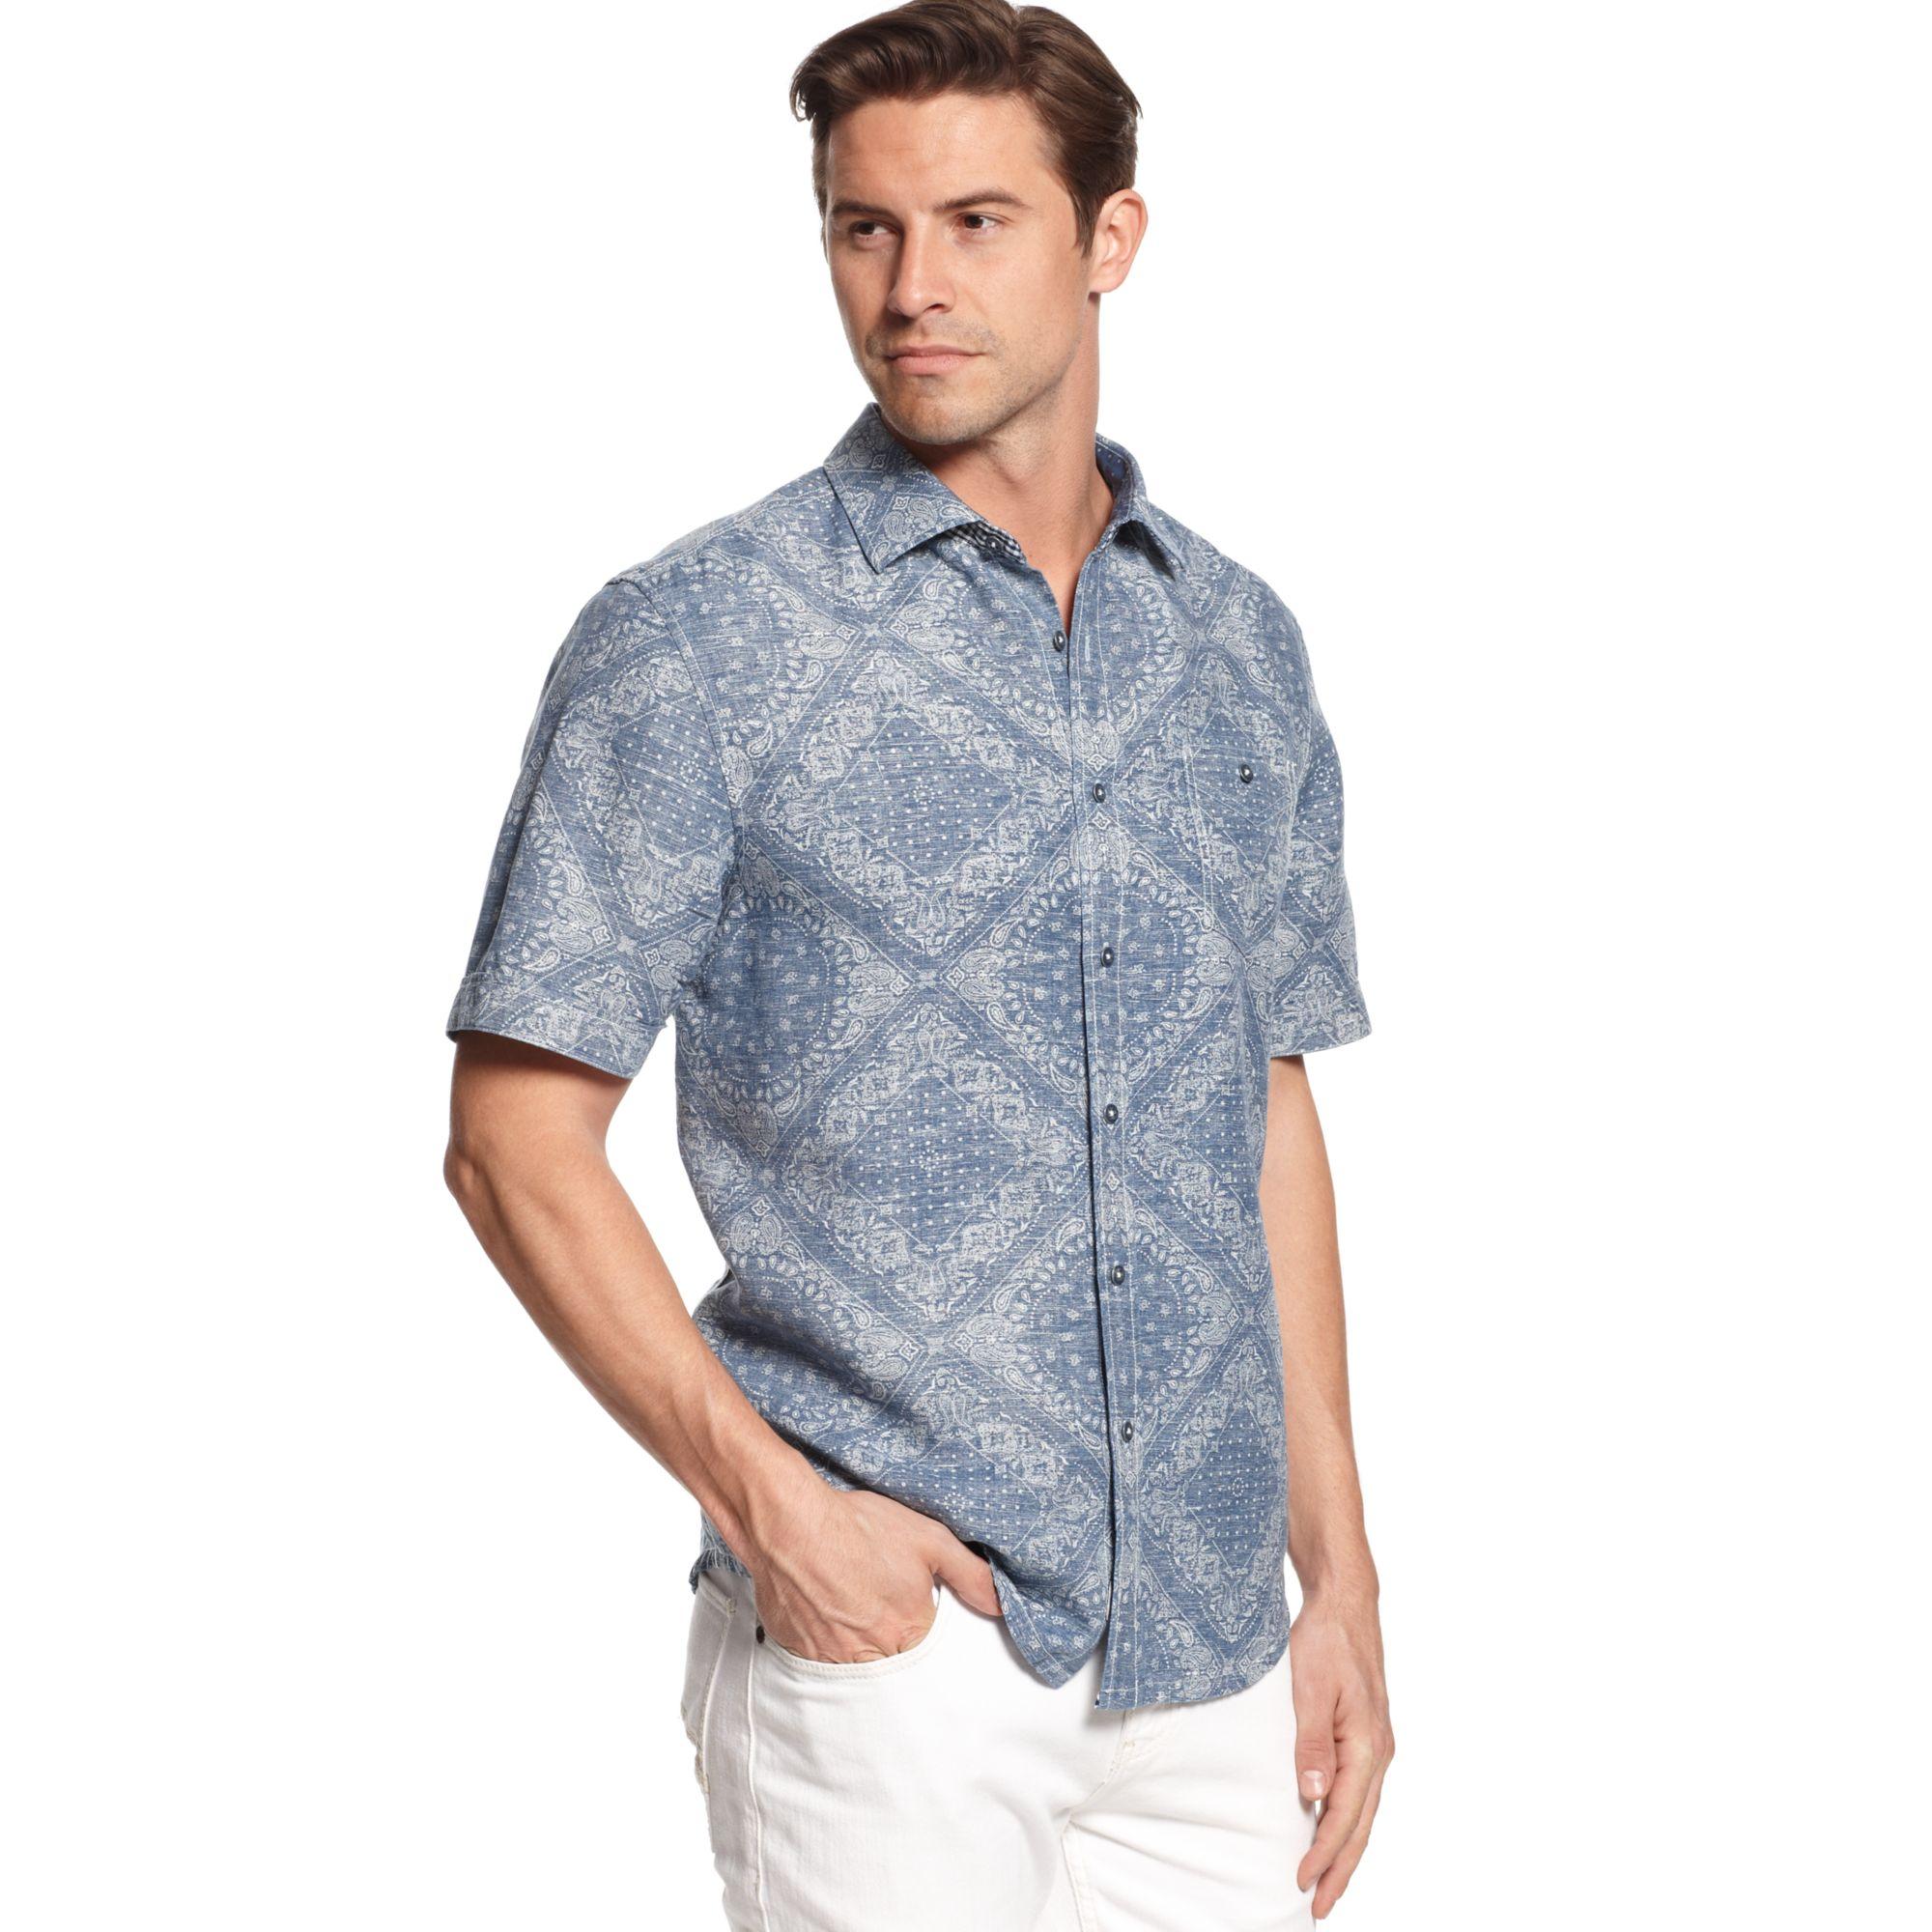 Tommy Bahama Bandana Stand Print Linenblend Shirt In Blue